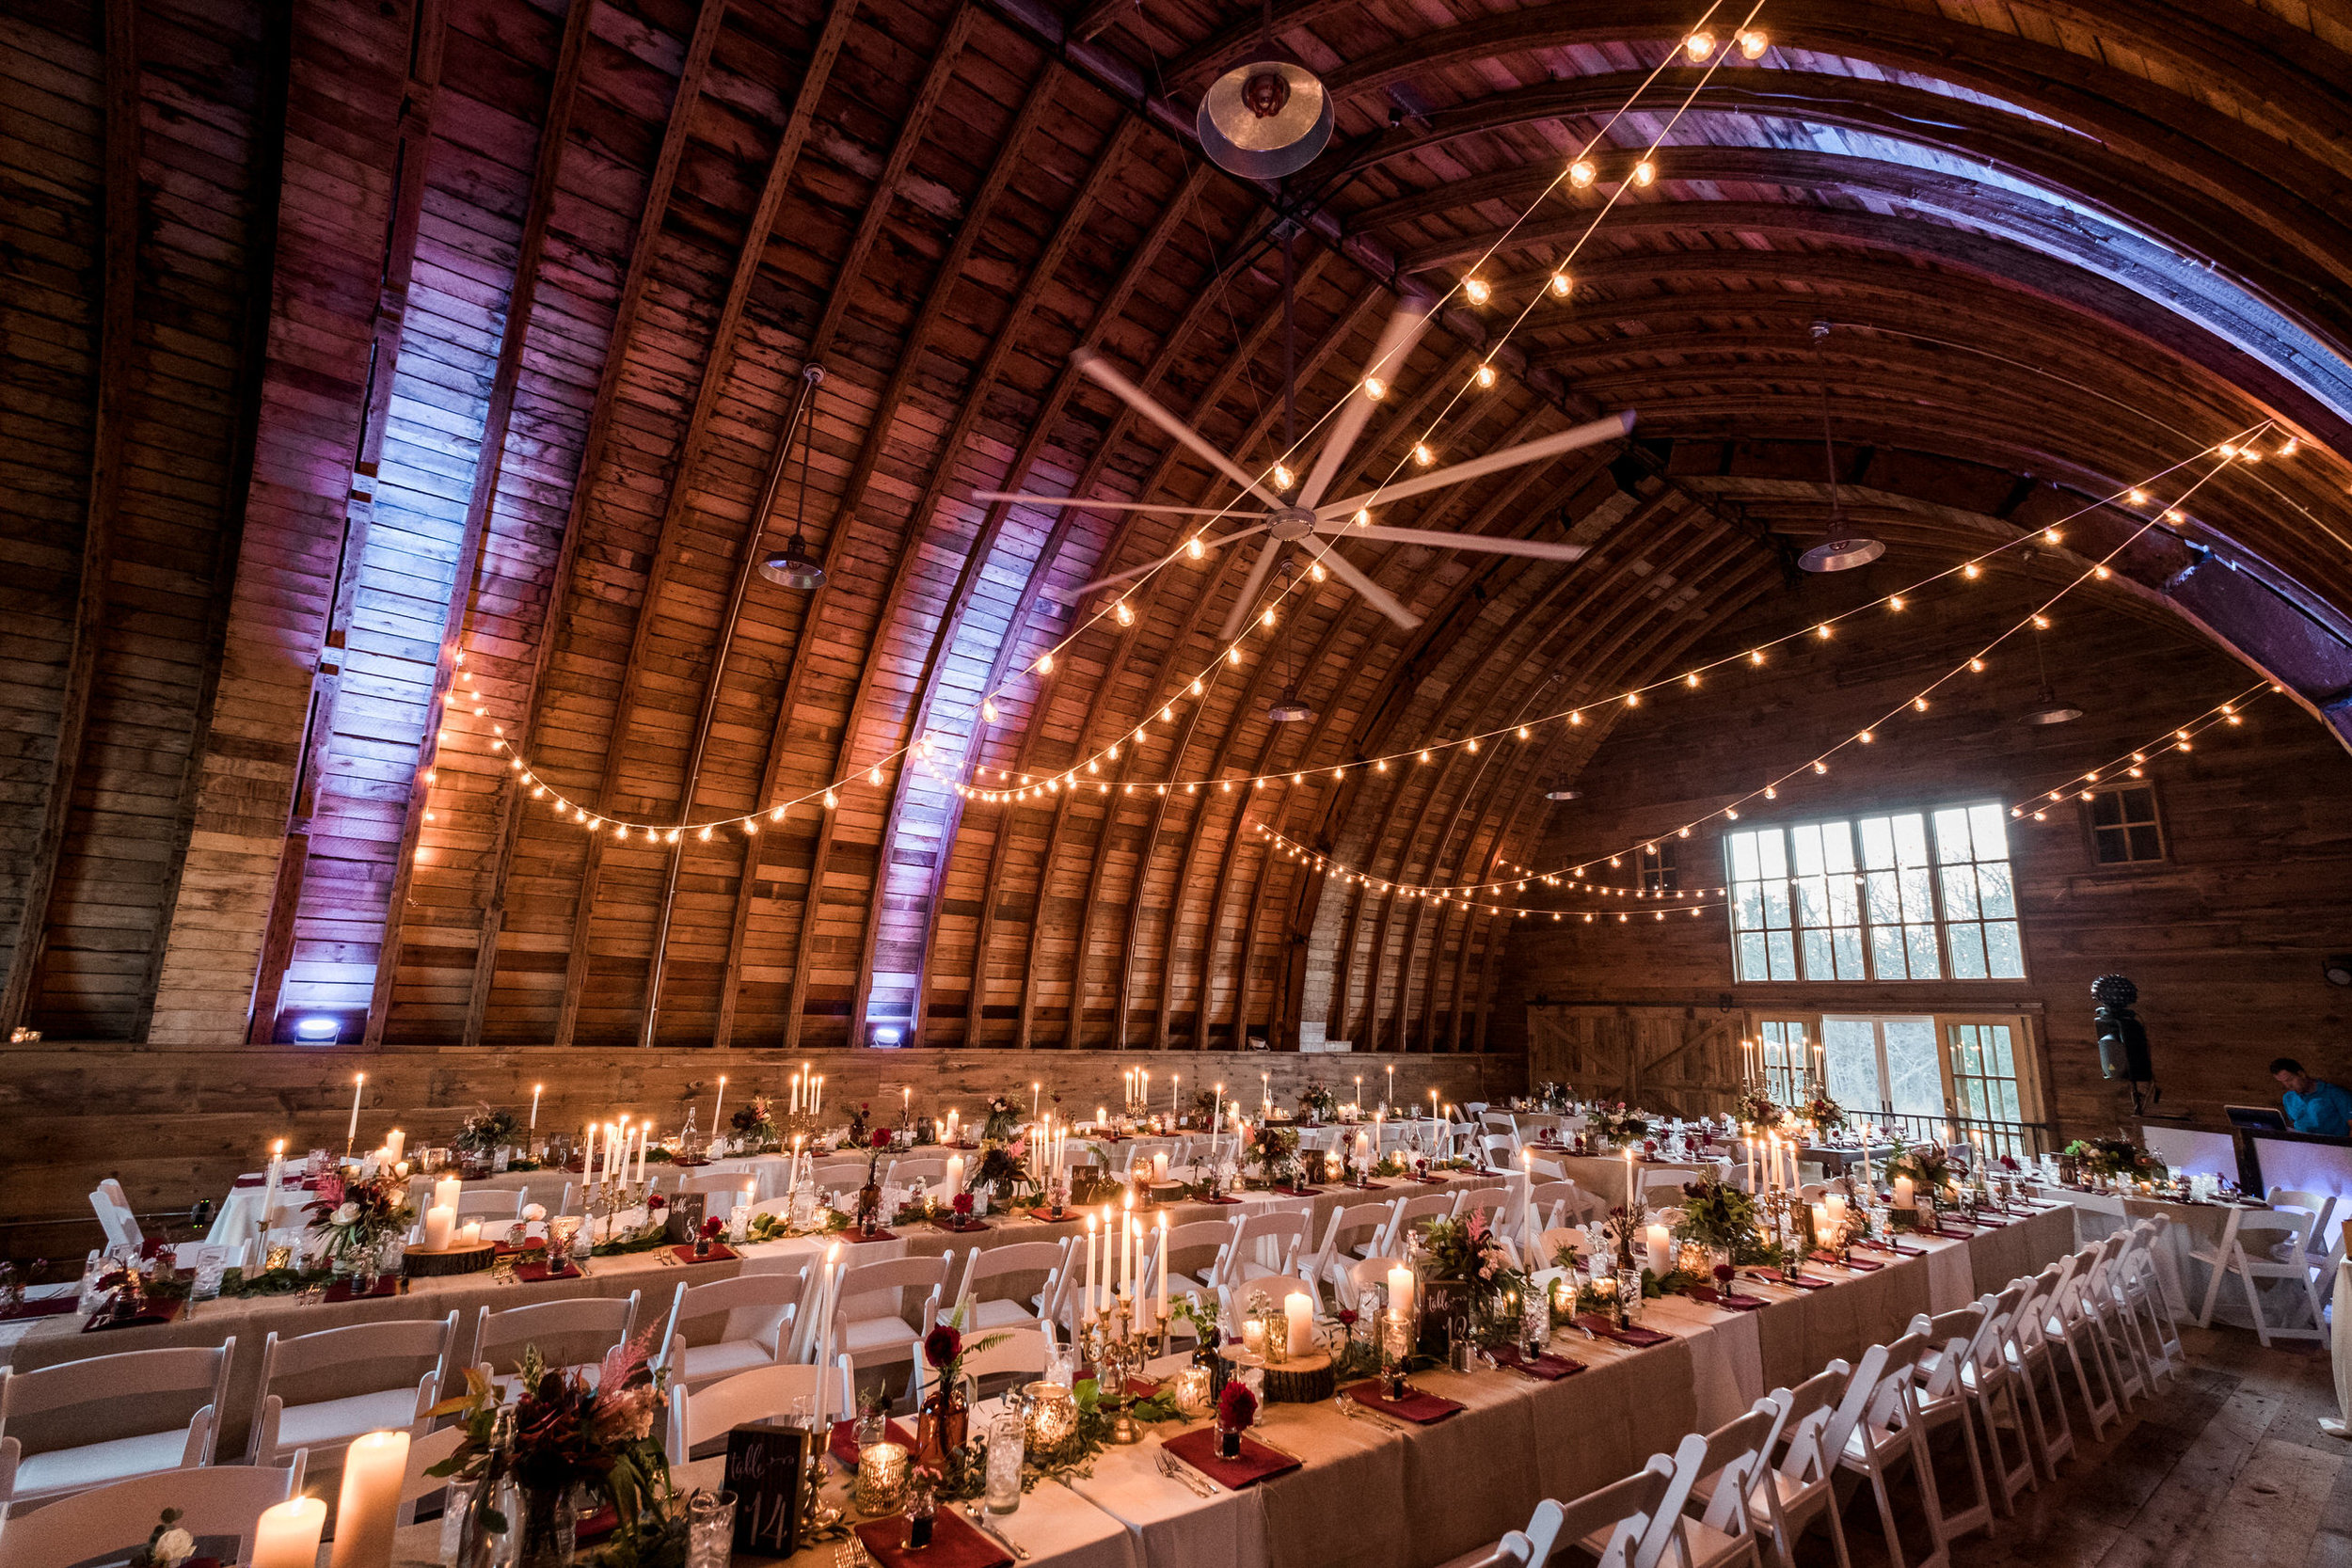 kate kuepers wedding planning brainerd, mn